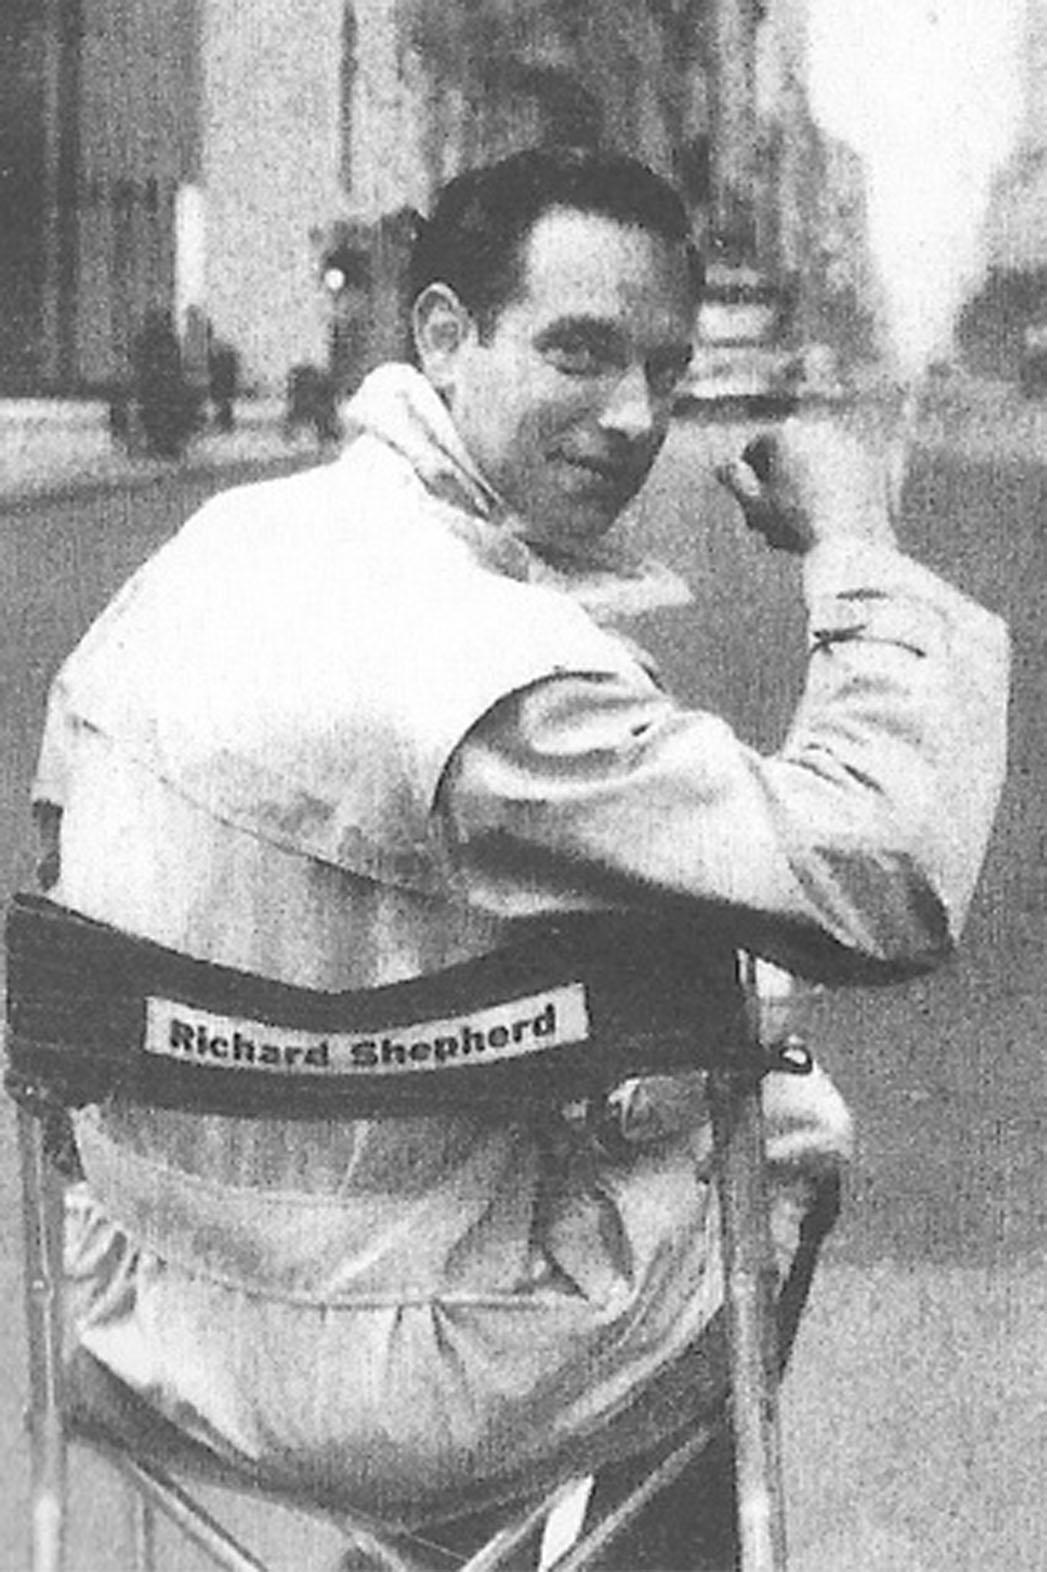 Richard Shepherd Director's Chair - P 2014